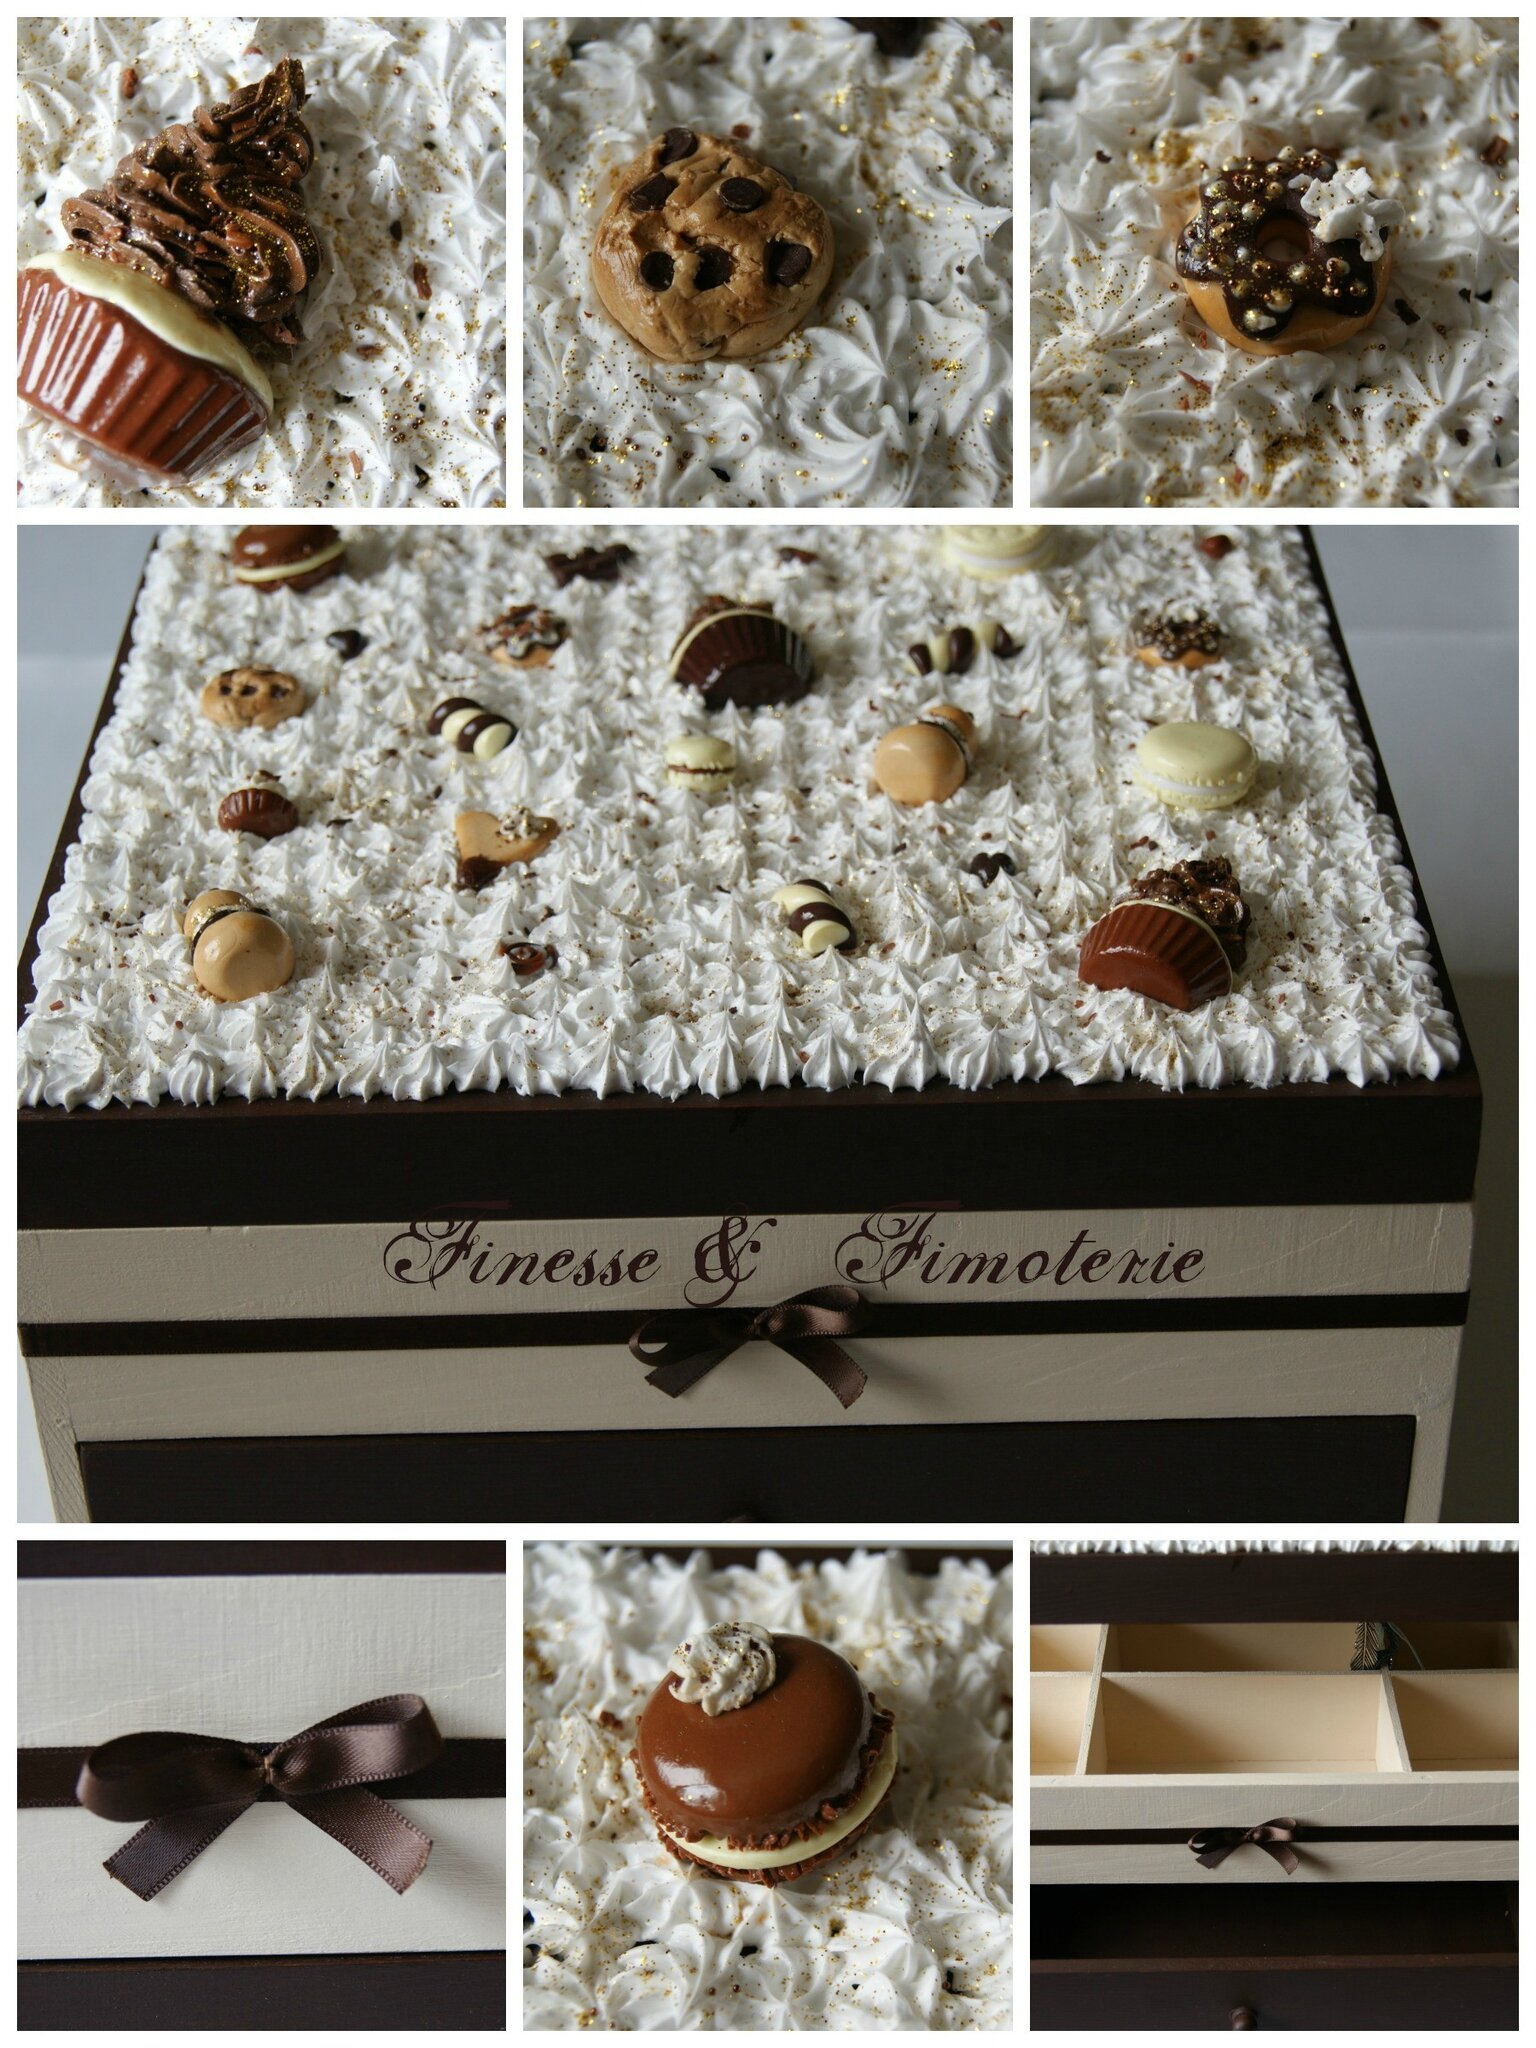 grosse boite gourmande thème chocolat